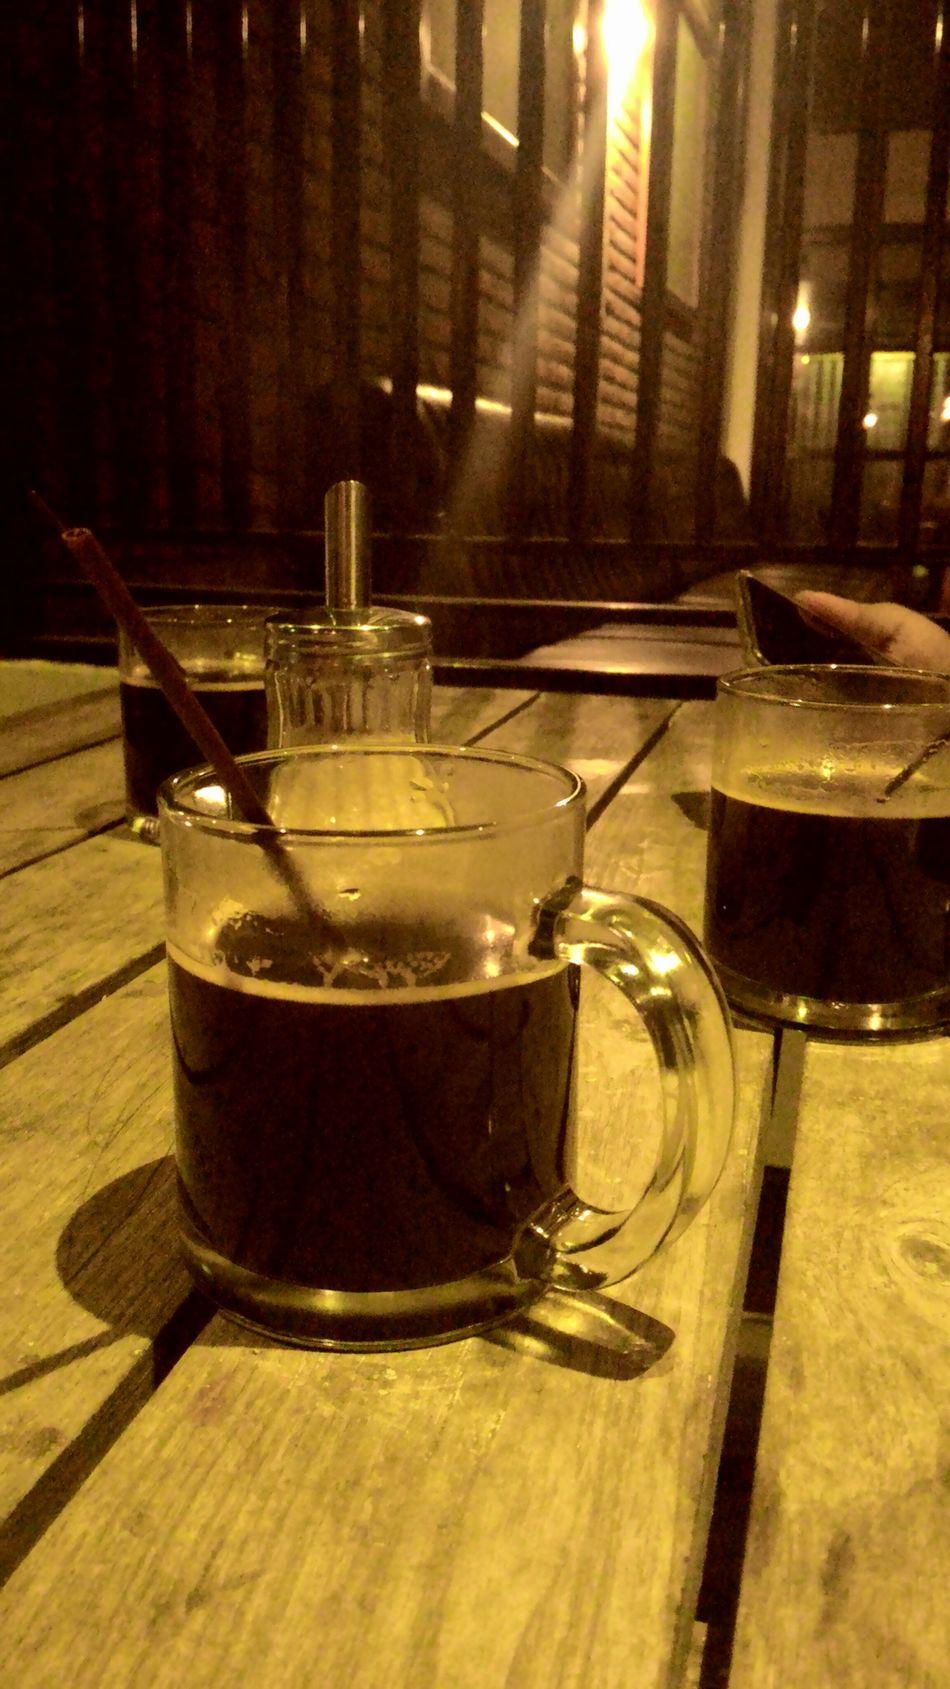 Espresso like coffee